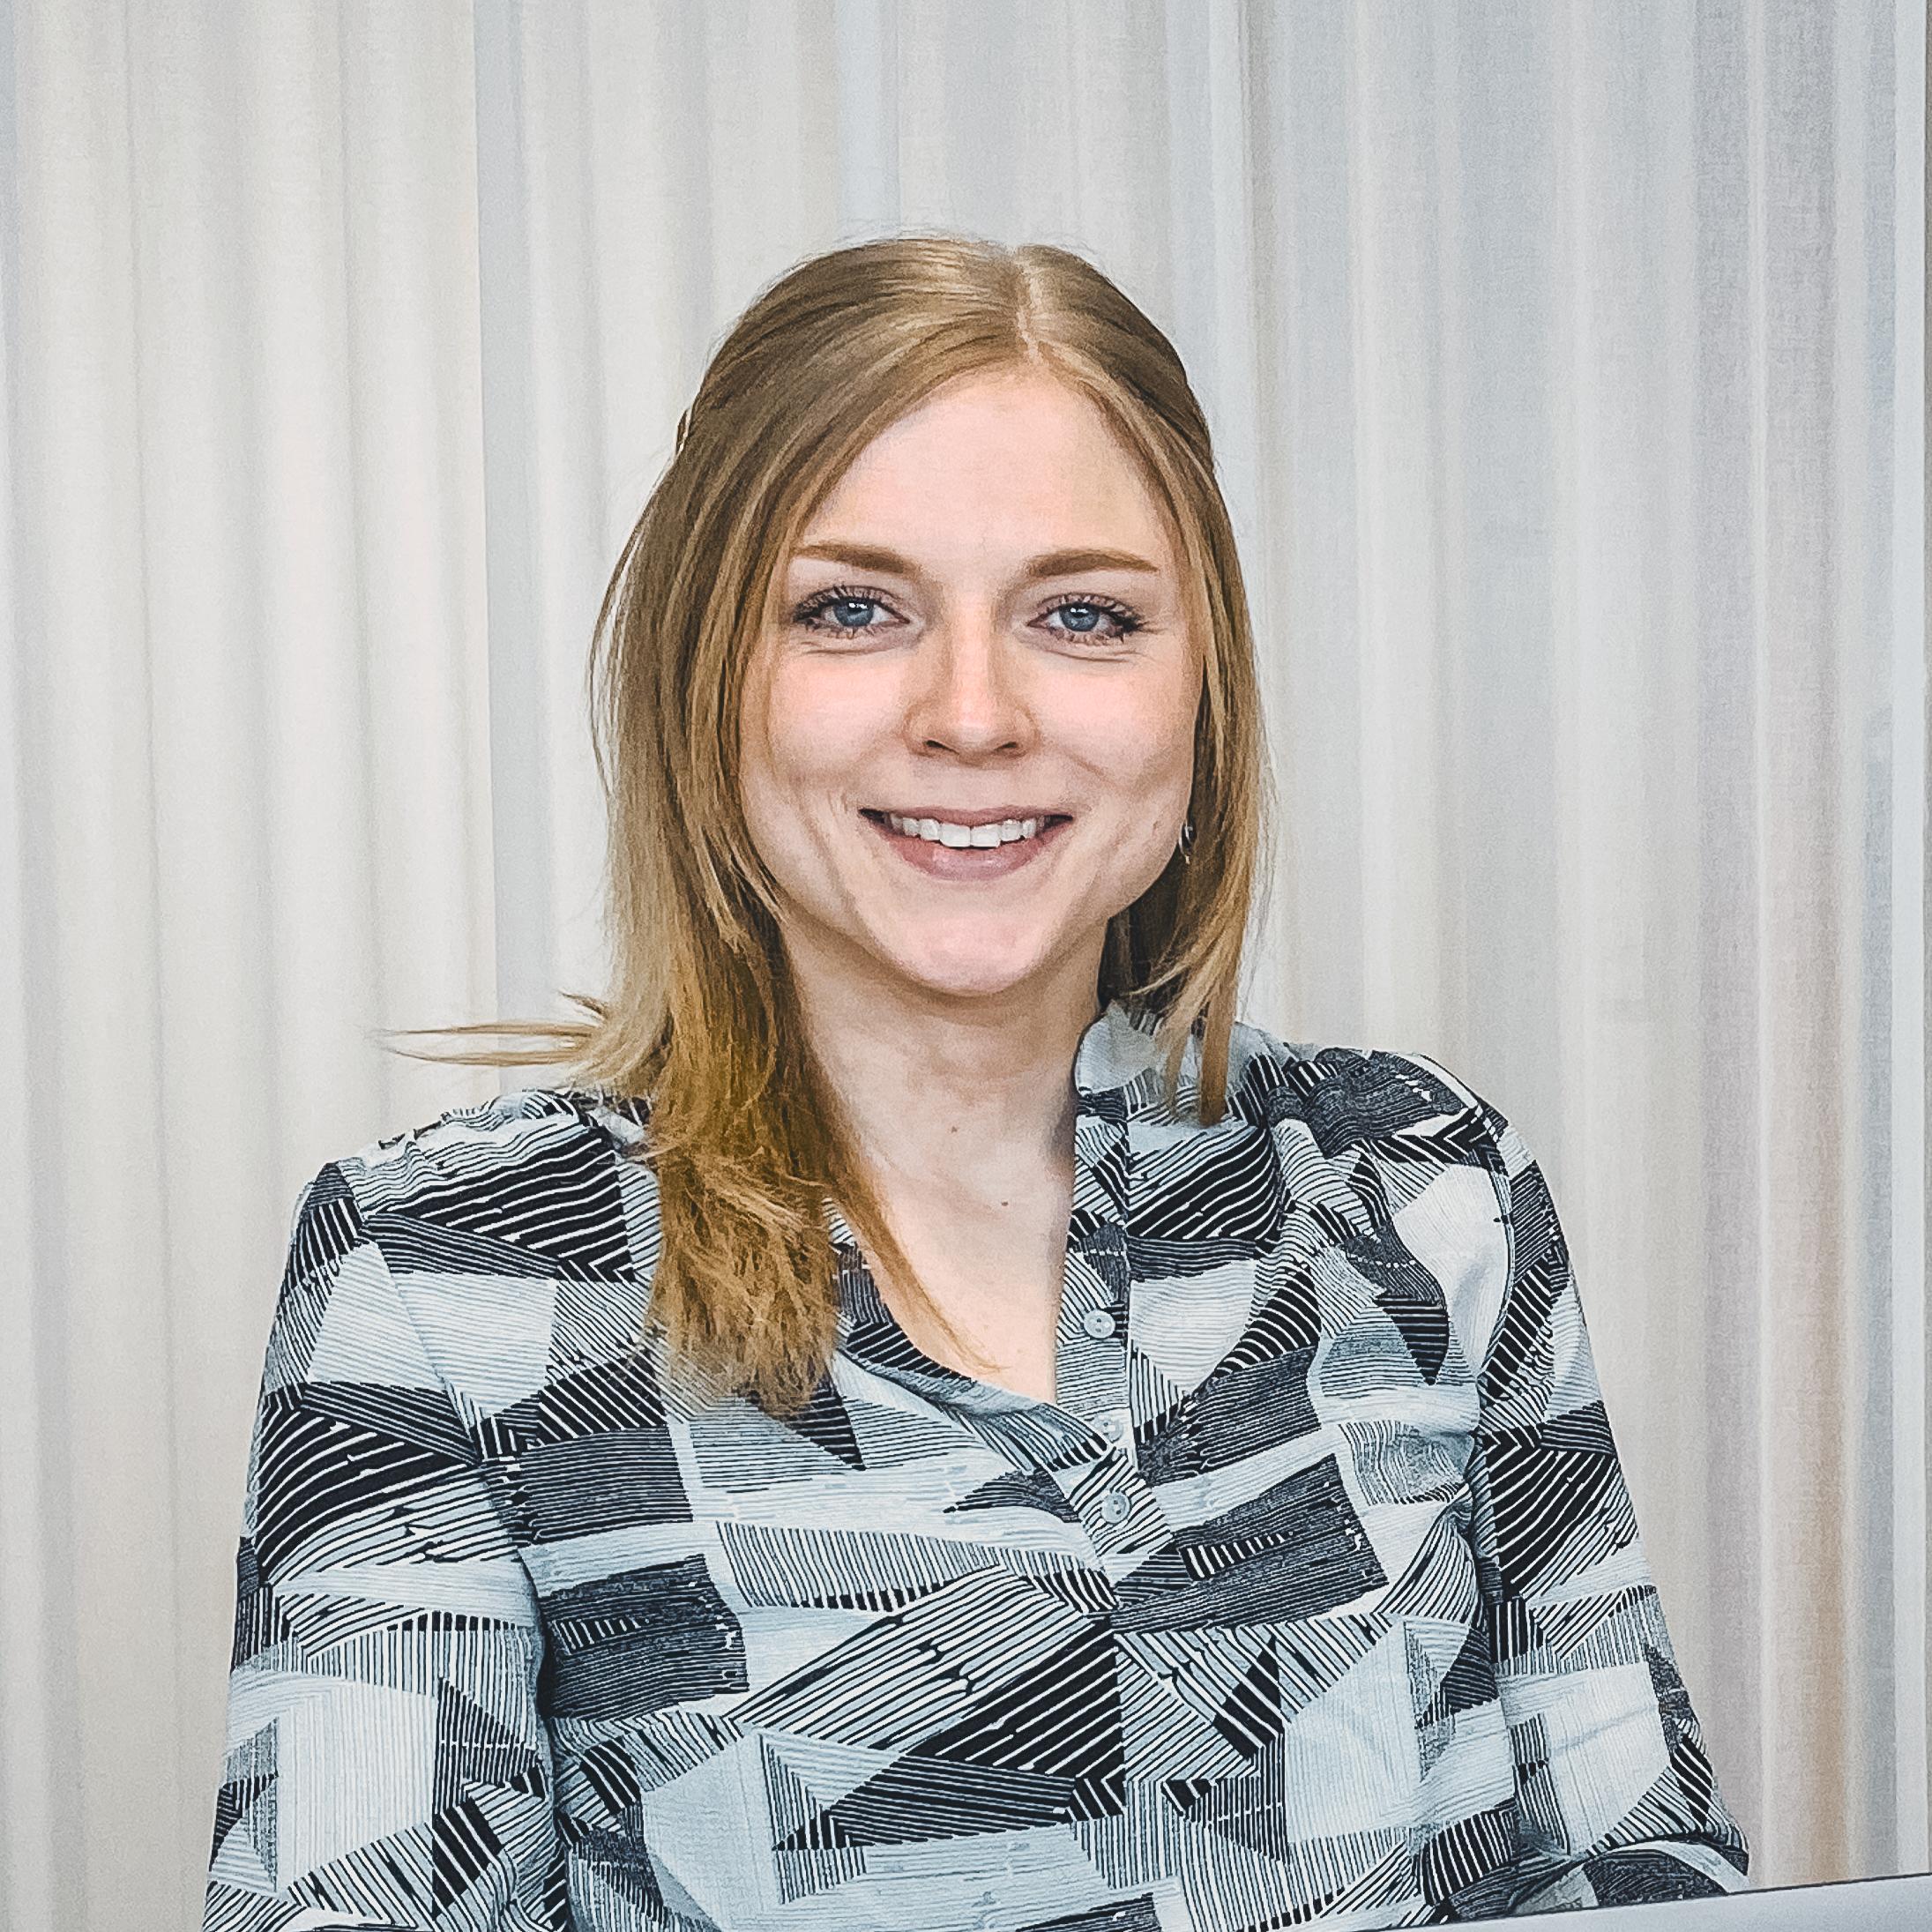 Clara Stenhardt